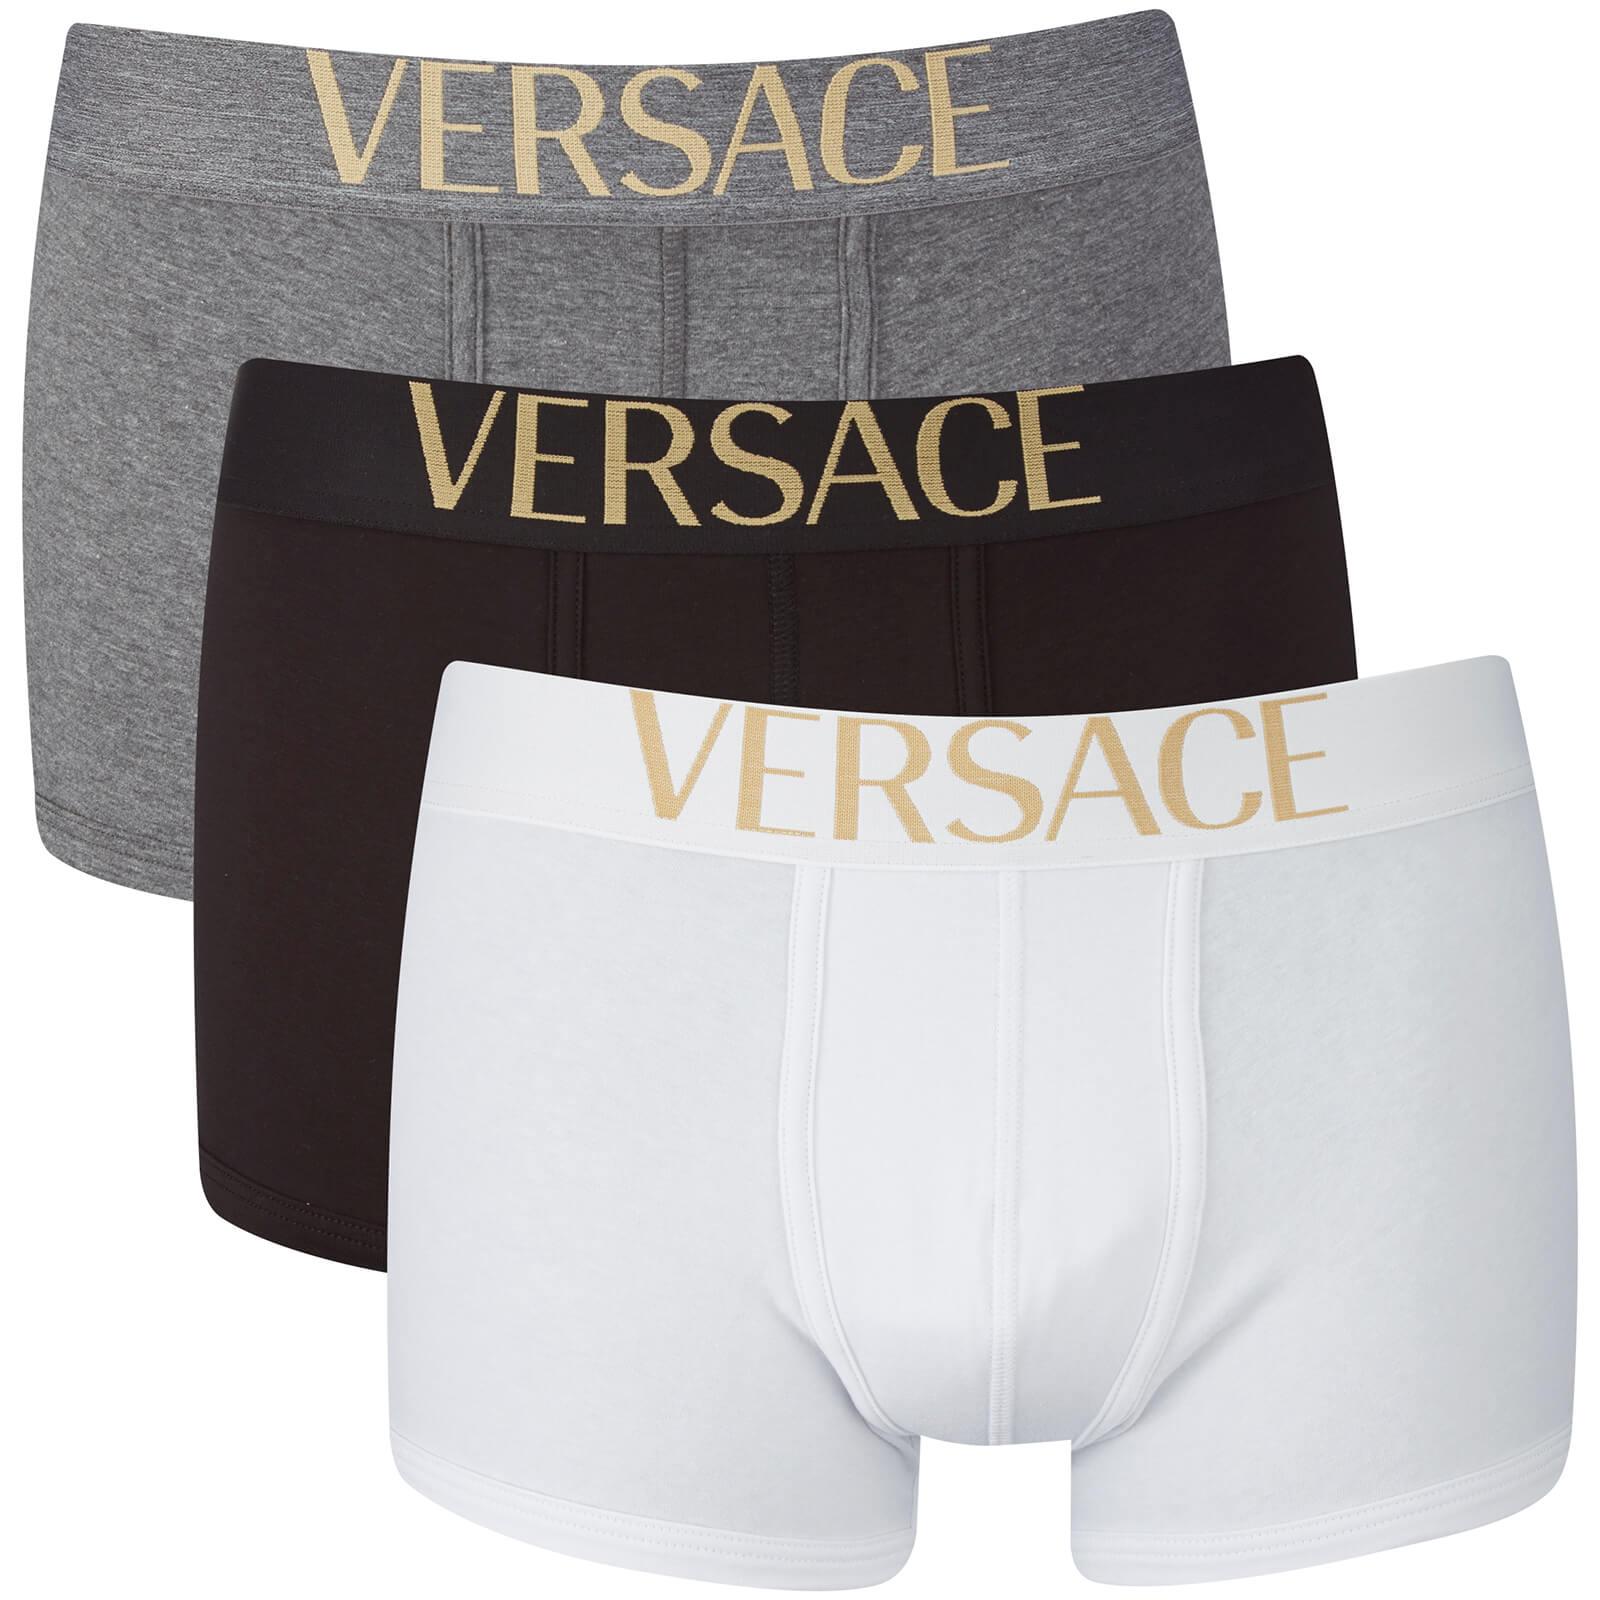 dacdf2cd88 Versus Versace Men's Low Rise Trunks - Nero-Grigio-Bianco - Free UK  Delivery over £50